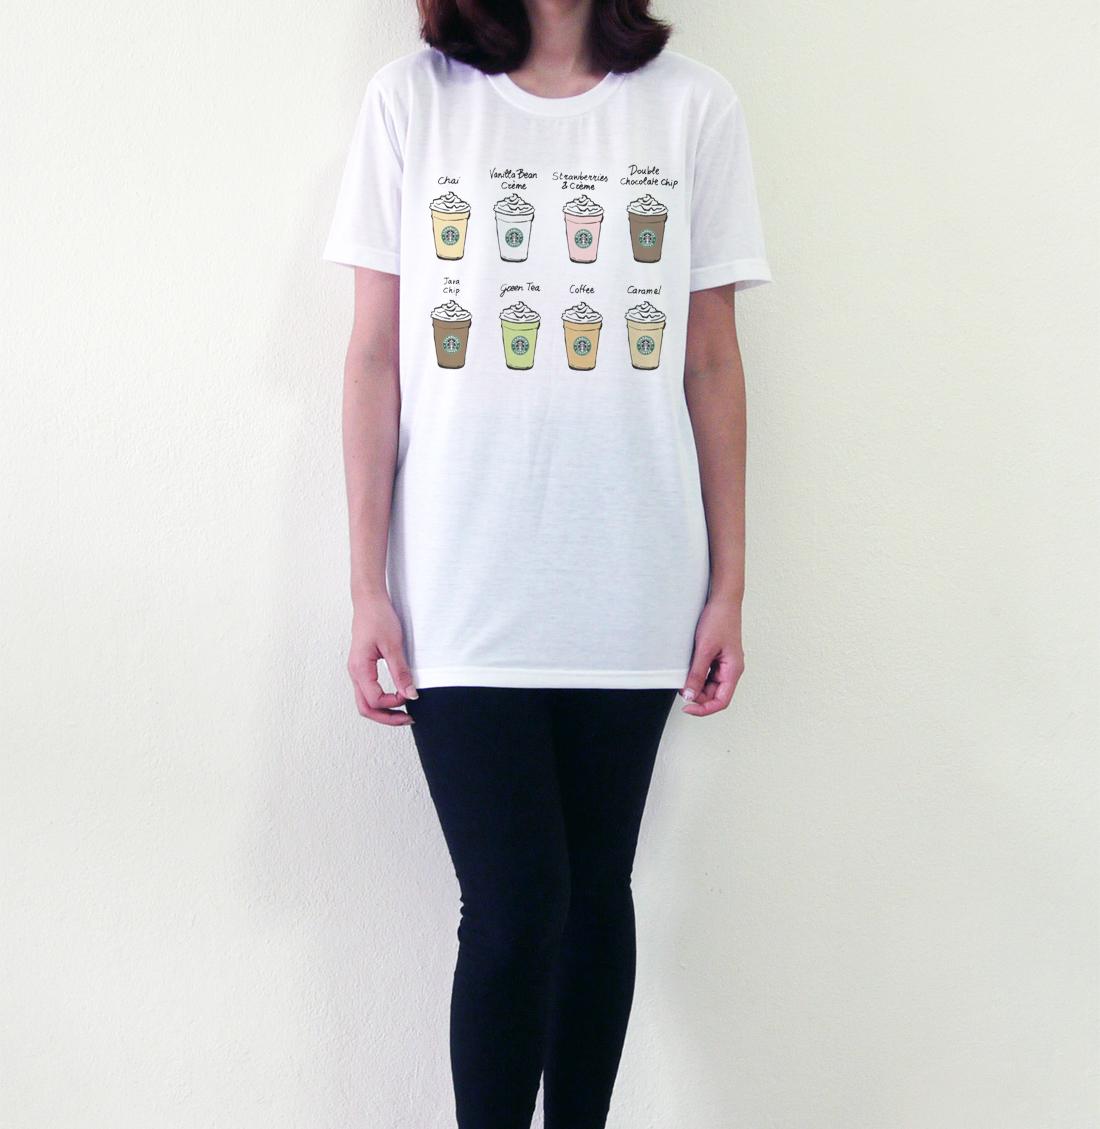 Starbucks Coffee T Shirts Starbucks Drawing Cup White Tee Shirts Size S M L - T-Shirts | RebelsMarket